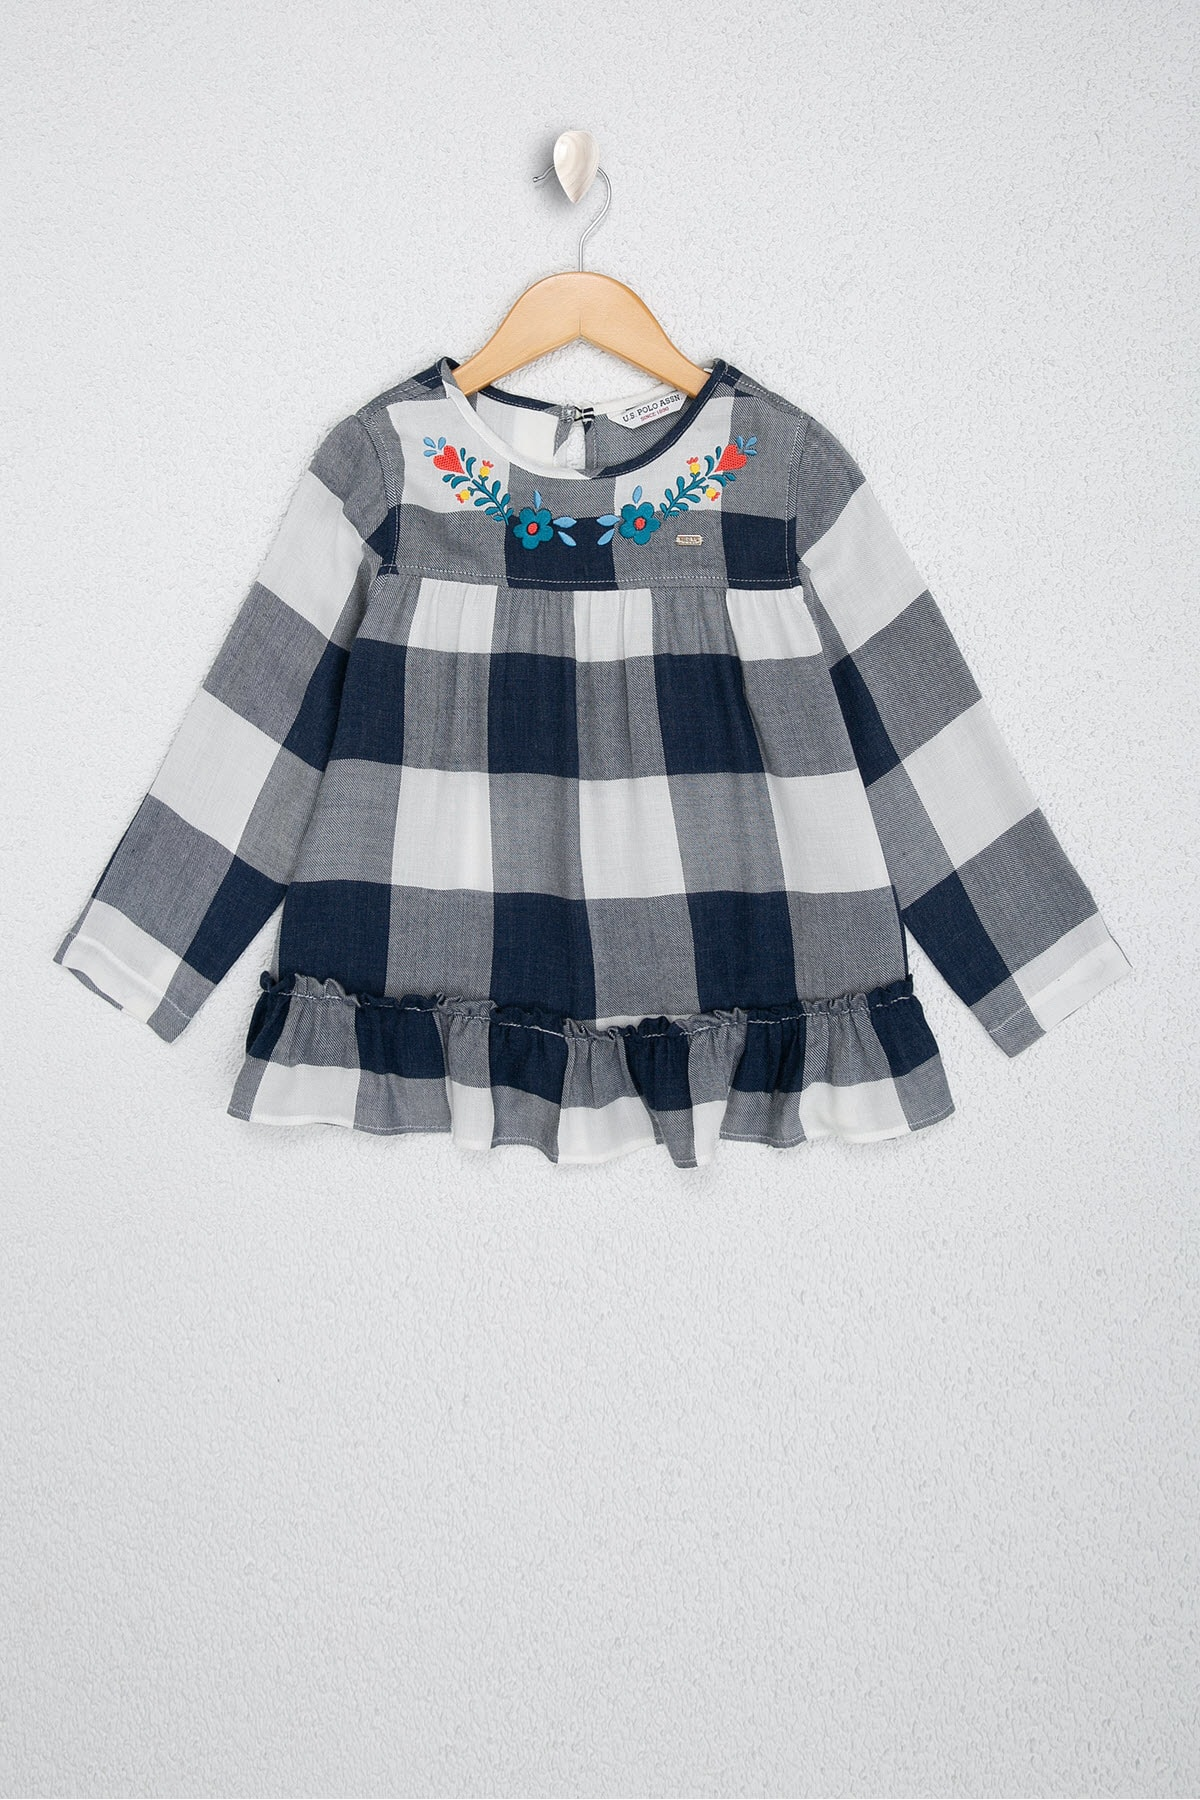 U.S. Polo Assn. Lacivert Kız Çocuk Dokuma Gömlek 1